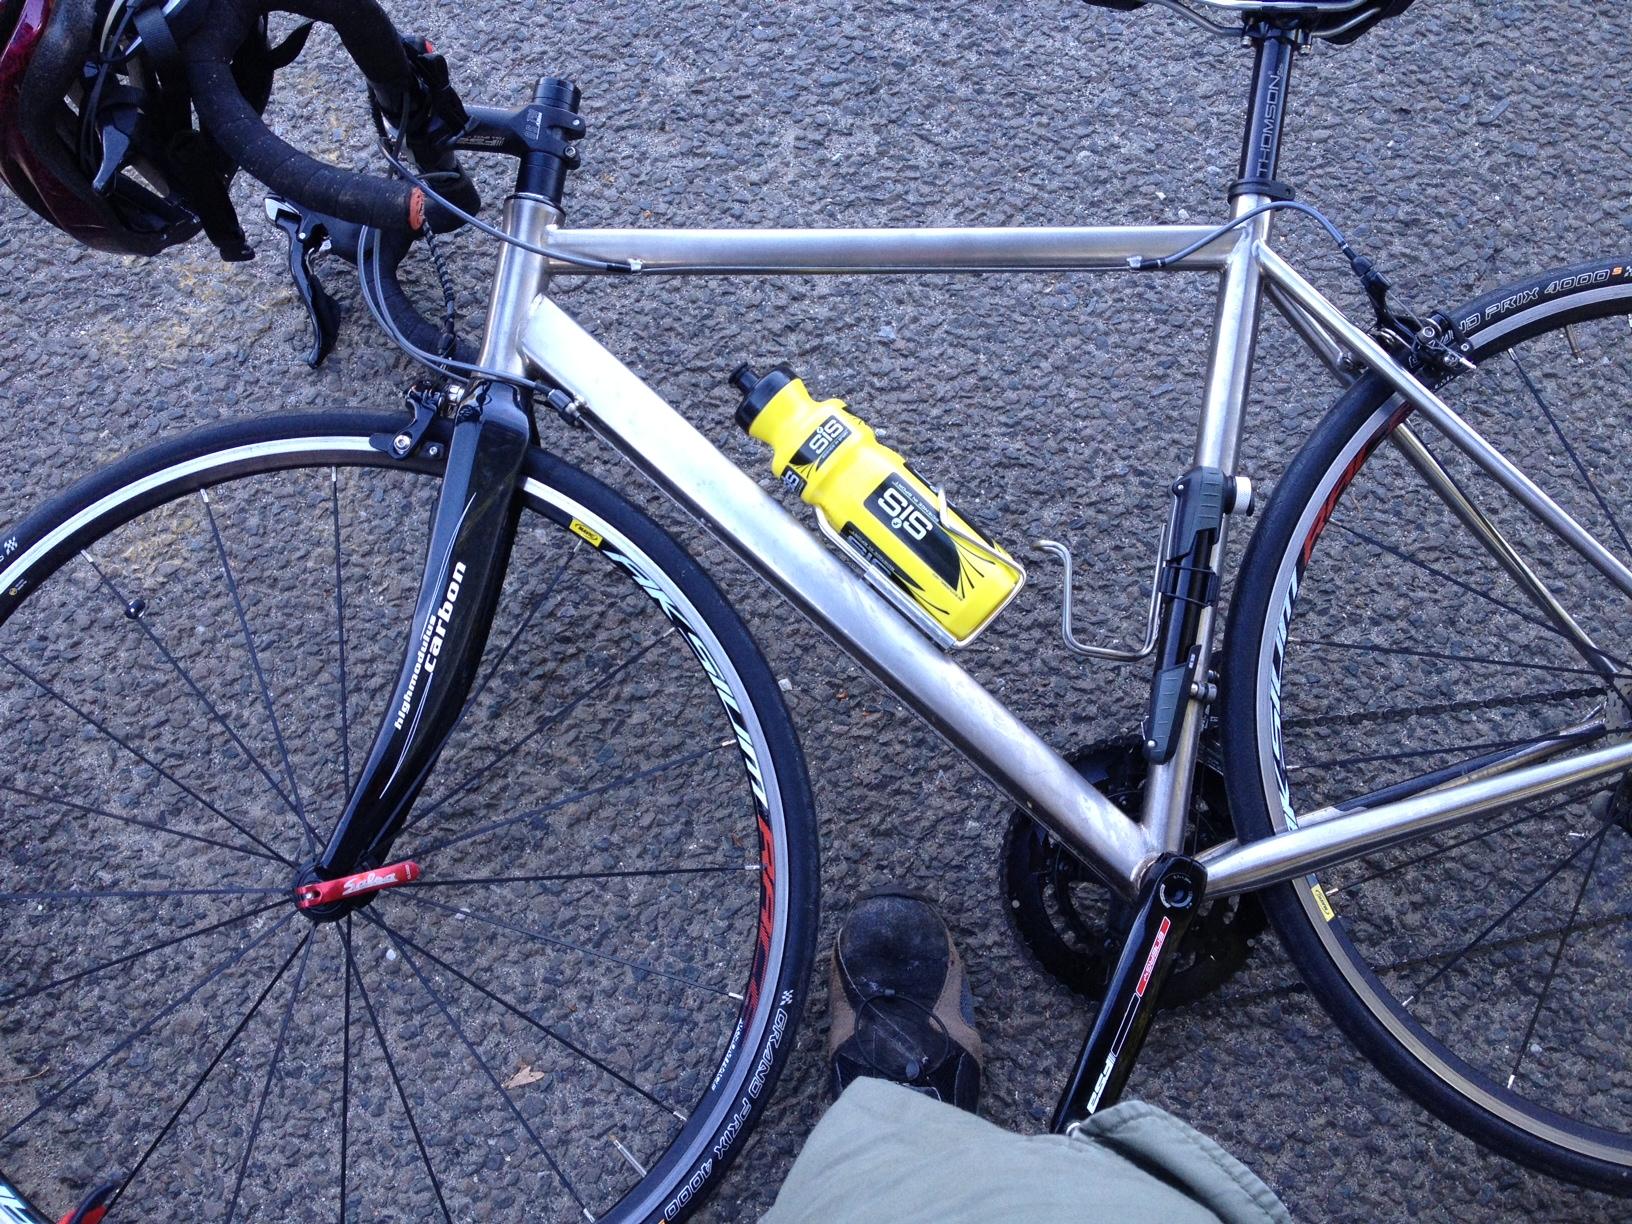 Bike This Annoys Me